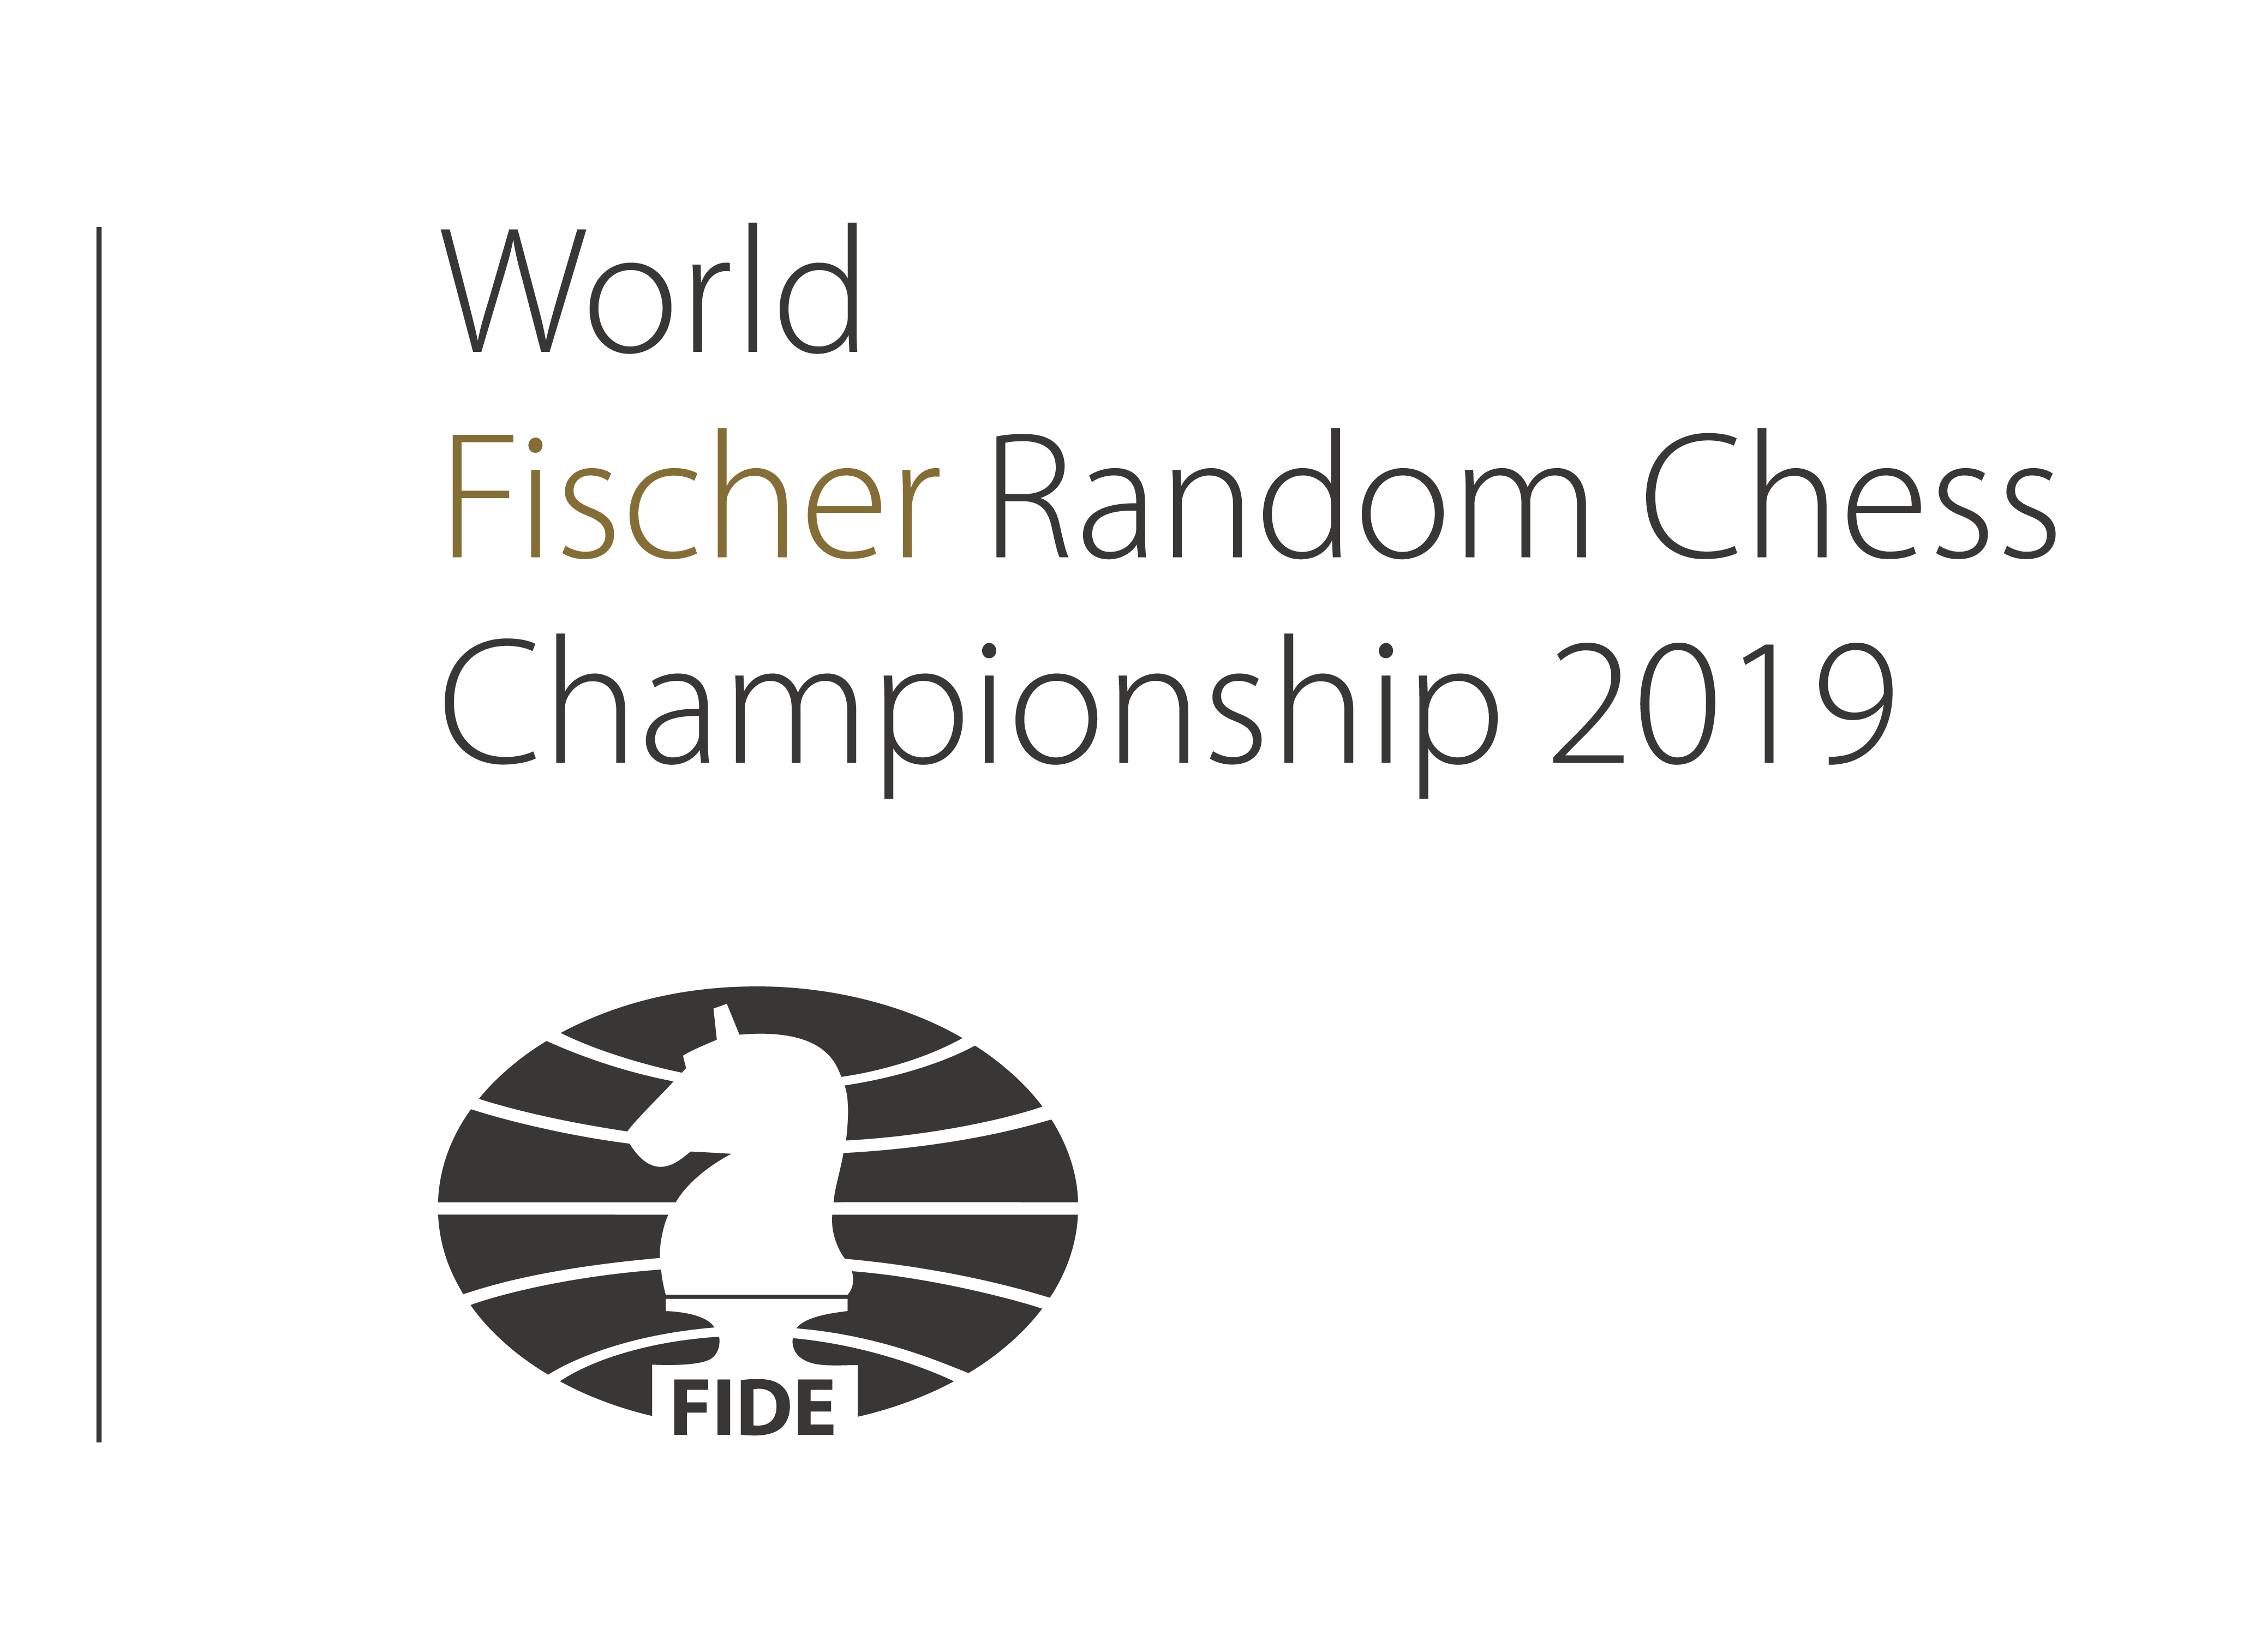 The Fischer Random Chess Championship 2019